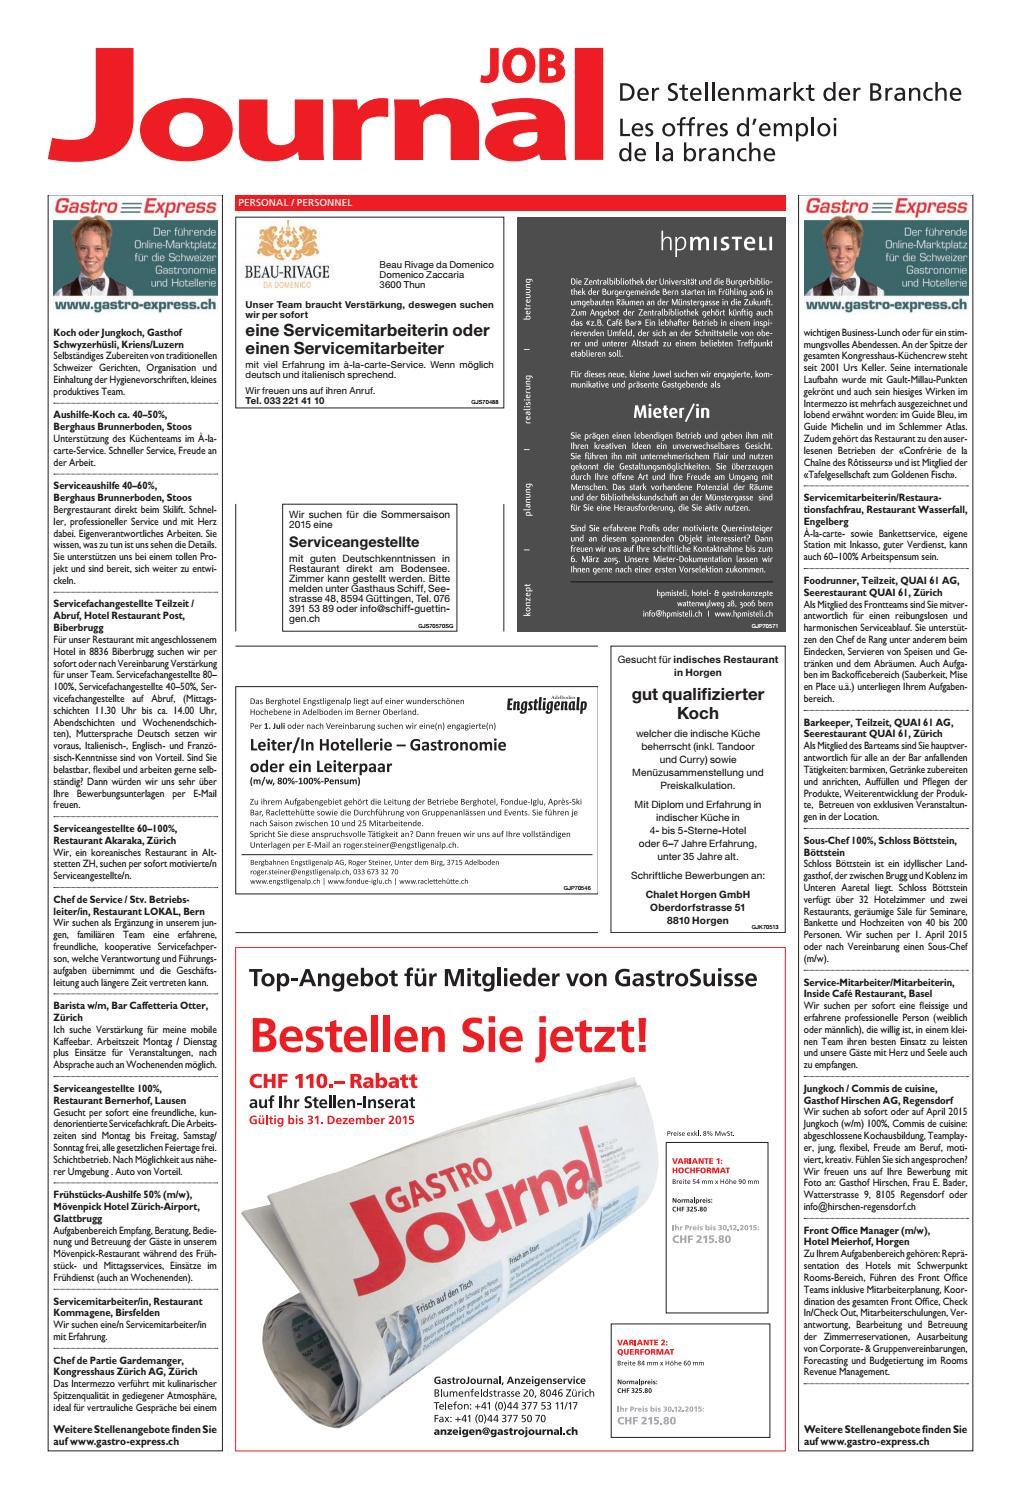 GastroJournal 08/2015 by Gastrojournal - issuu